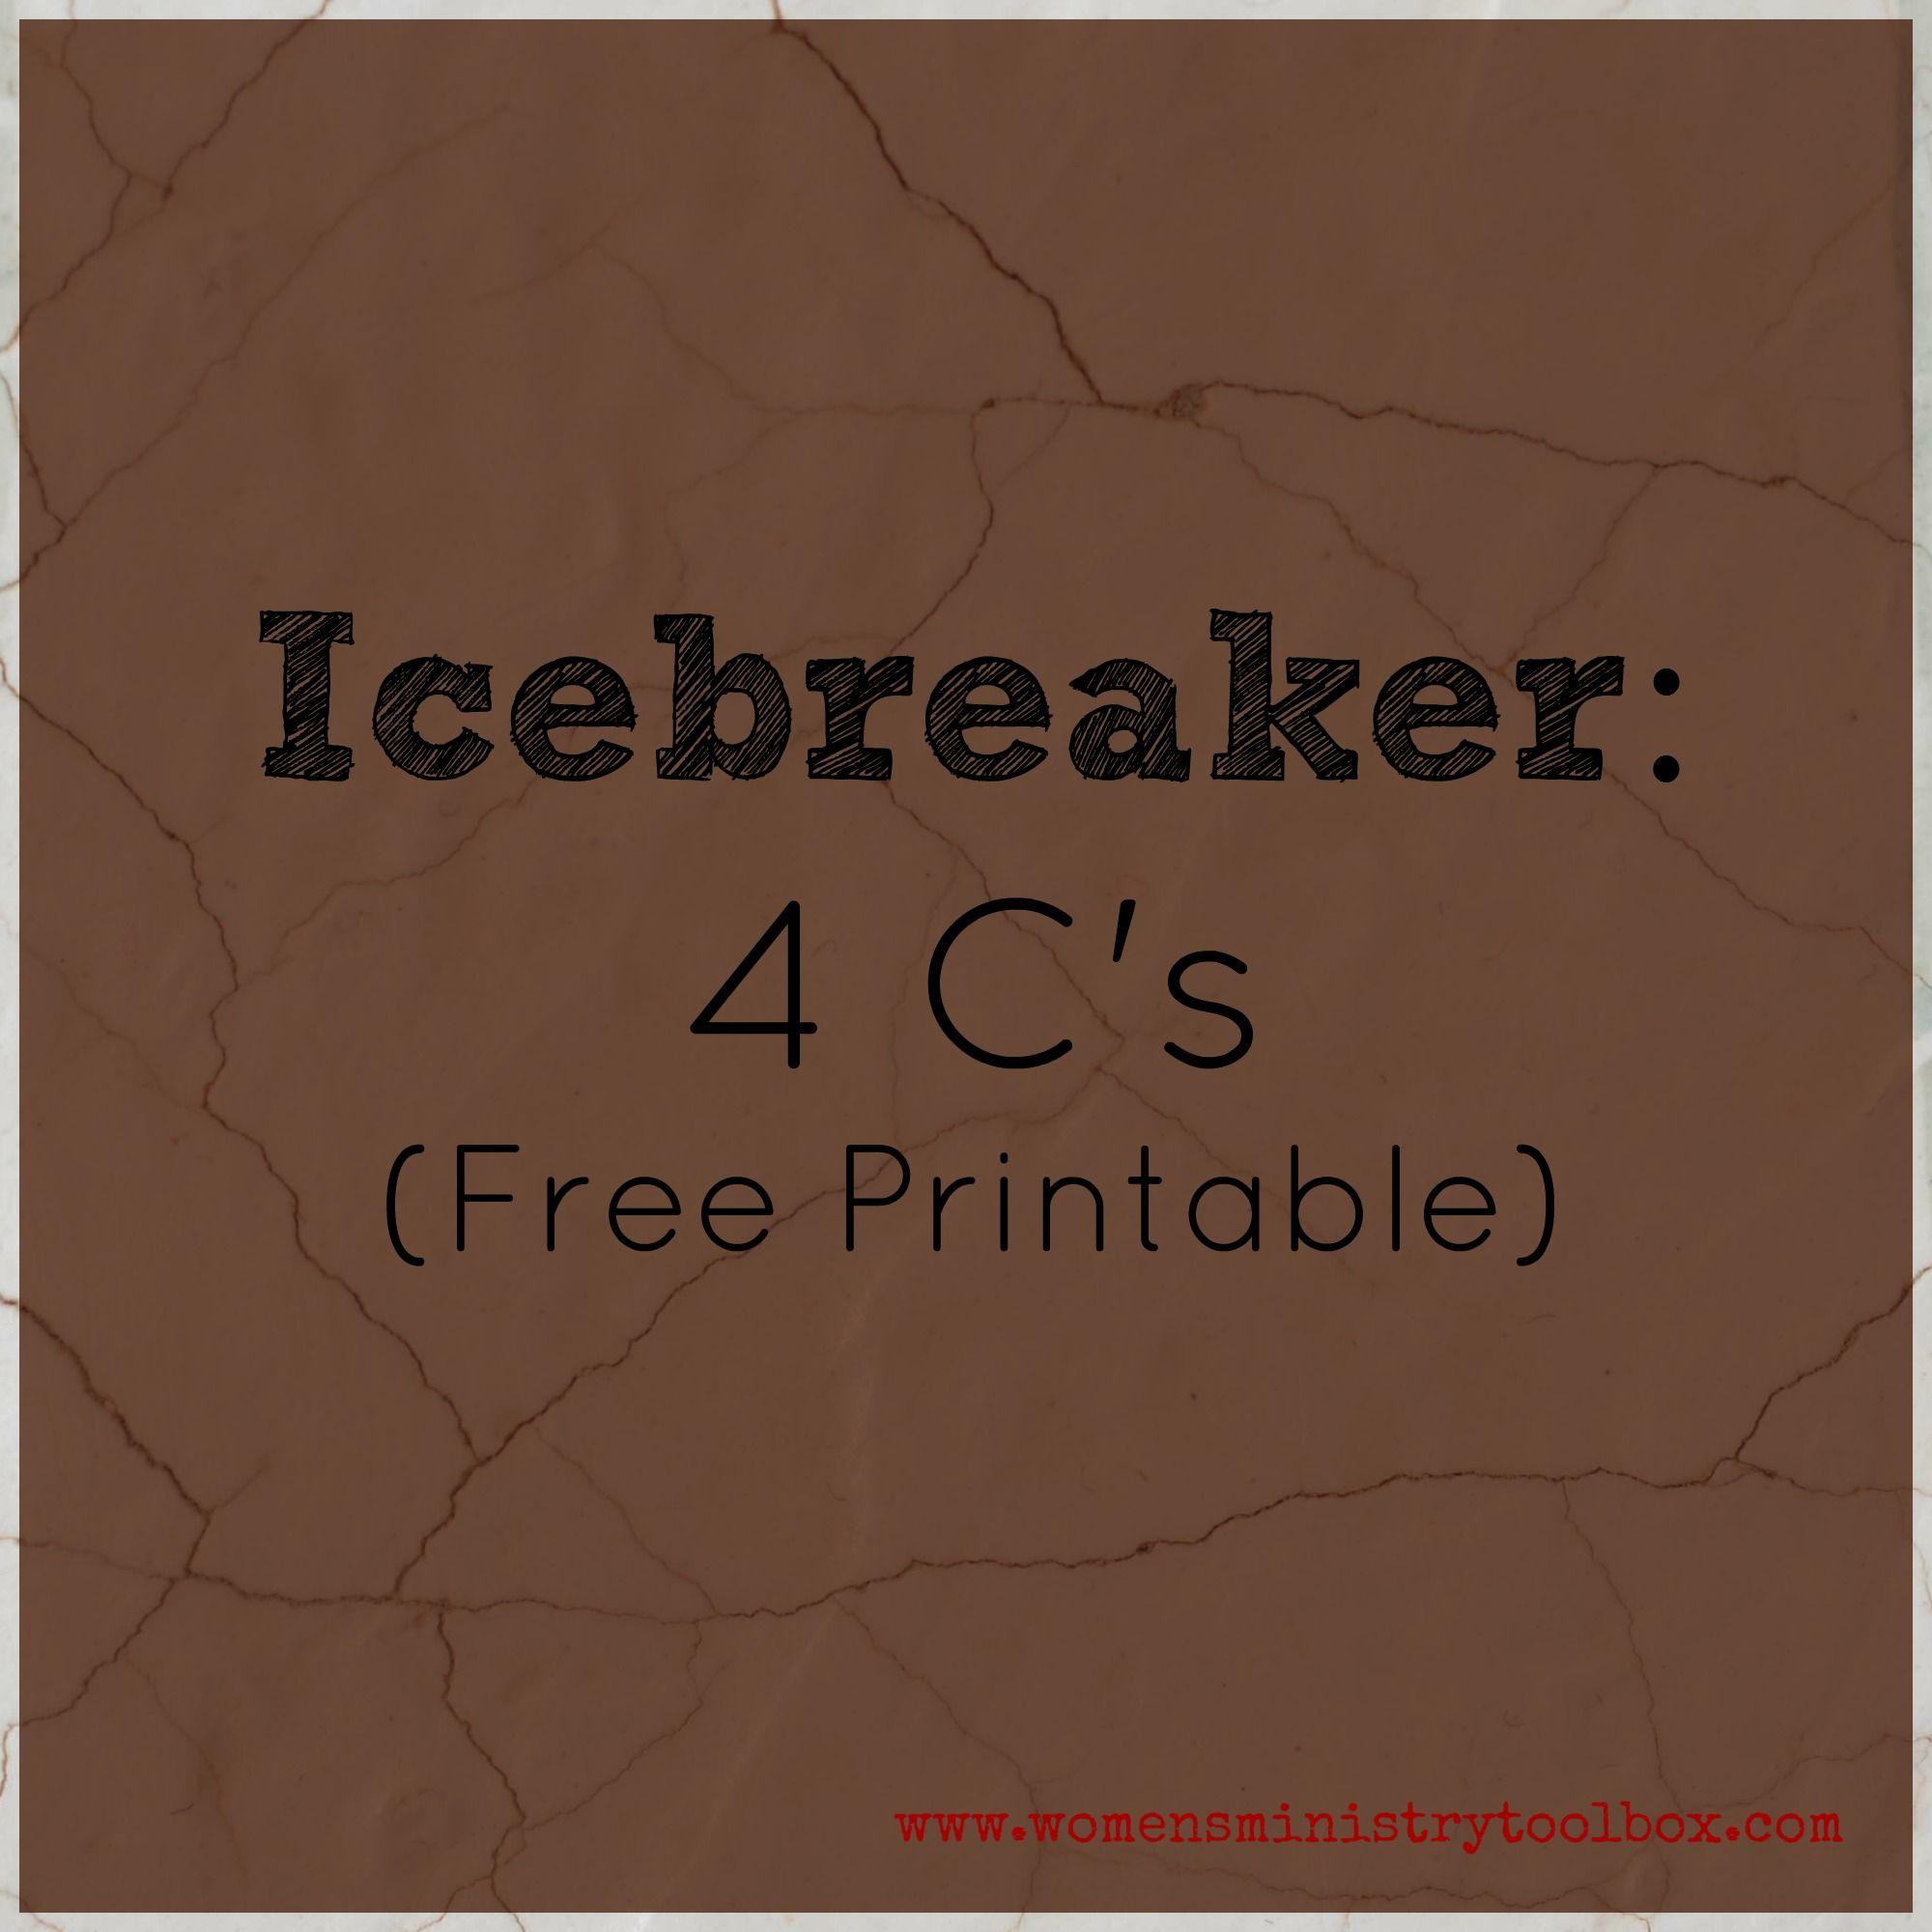 Icebreaker: 4 C's (Free Printable | Women's Ministry | Pinterest - Free Printable Women's Party Games